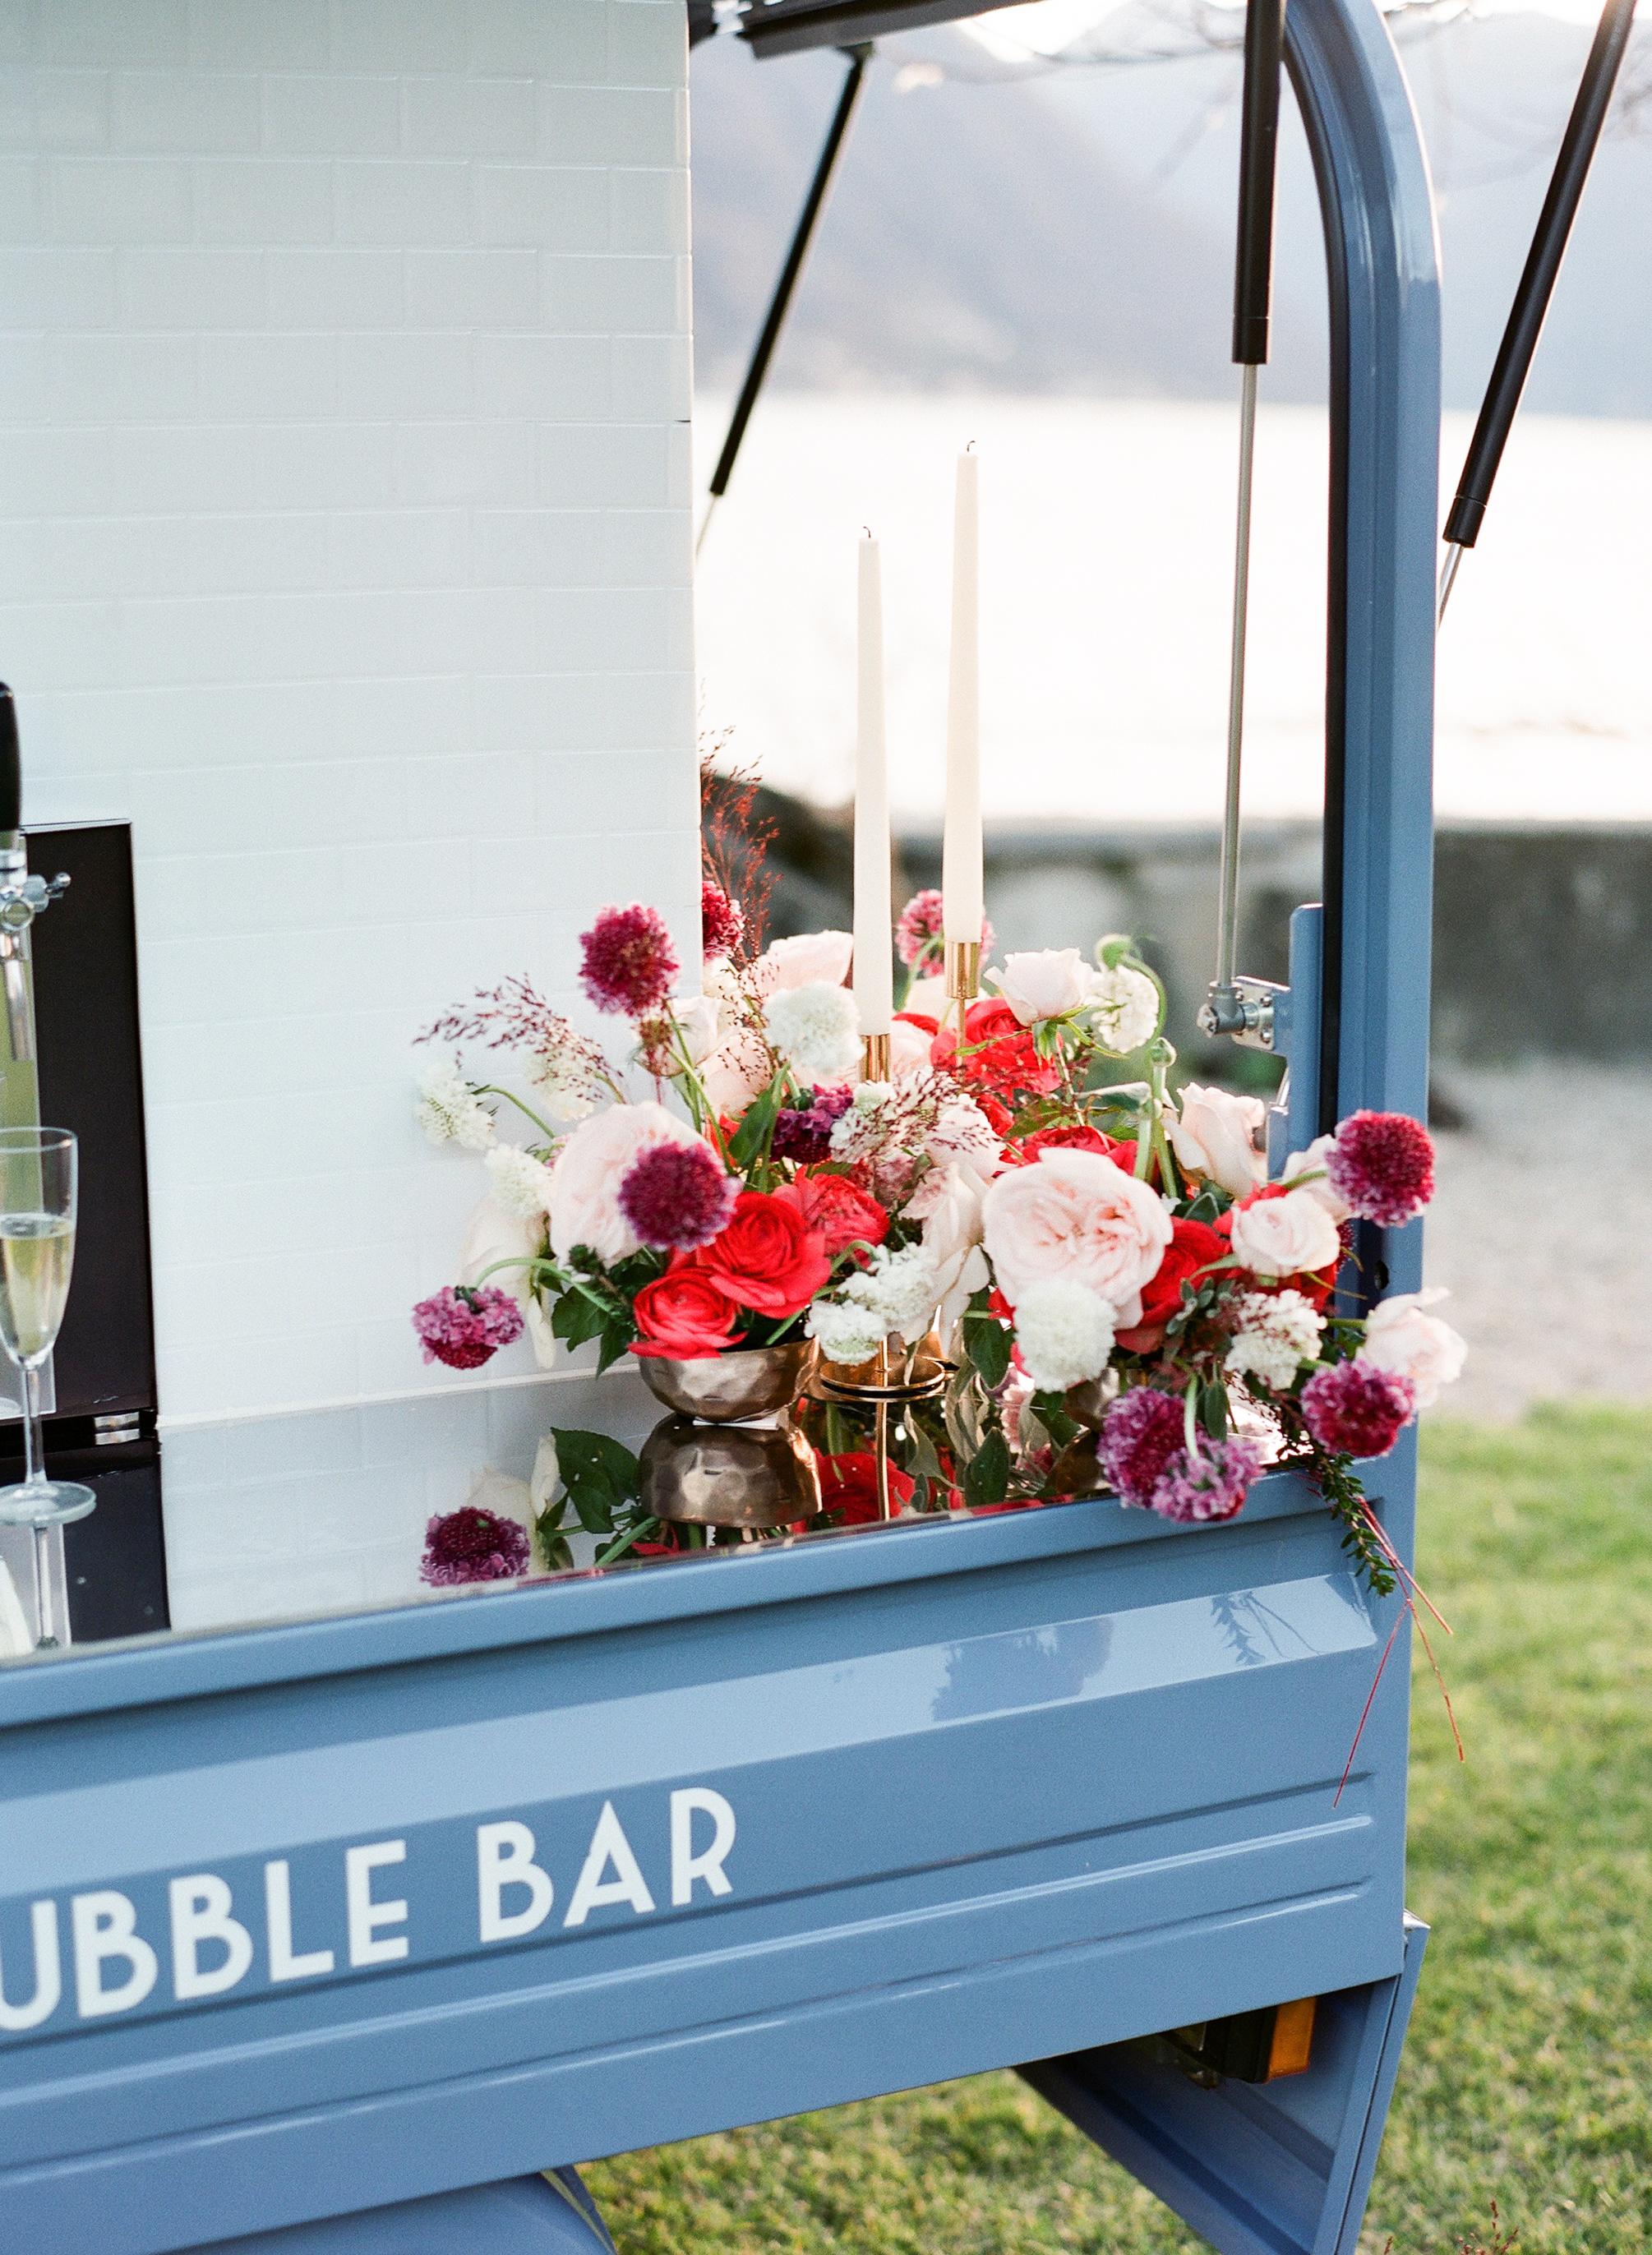 Extra - ....Extra Bubbles - Se preferisci avere più di 200 bicchieri di vino, siamo felici di offrirtene quanti ne desideri.Bicchieri - Possiamo offrire una grande varietà di flute o bicchieri, anche personalizzati in base alla tipologia di evento o gusto personale.Cocktails - grazie al innovativo design della nostra Ape possiamo provvedere a servire anche numerosi mix a base di vino come Spritz, Mimosa o Bellini...Extra Bubbles - If you wish to have more than 200 glasses of bubbles we are happy to offer as many barrels as you need.Glassware – The bubble bar can offer a variety flutes depending on the style of your event and personal preference.Cocktails - Thanks to the innovative design of our ape, there is an added tap for all of your mixed drink needs. Your guests can experience the best of a bubble brunch with our mimosa or peach Bellini mix in addition to the traditional Italian spritz made with Aperol. Other mixers are available upon request.....